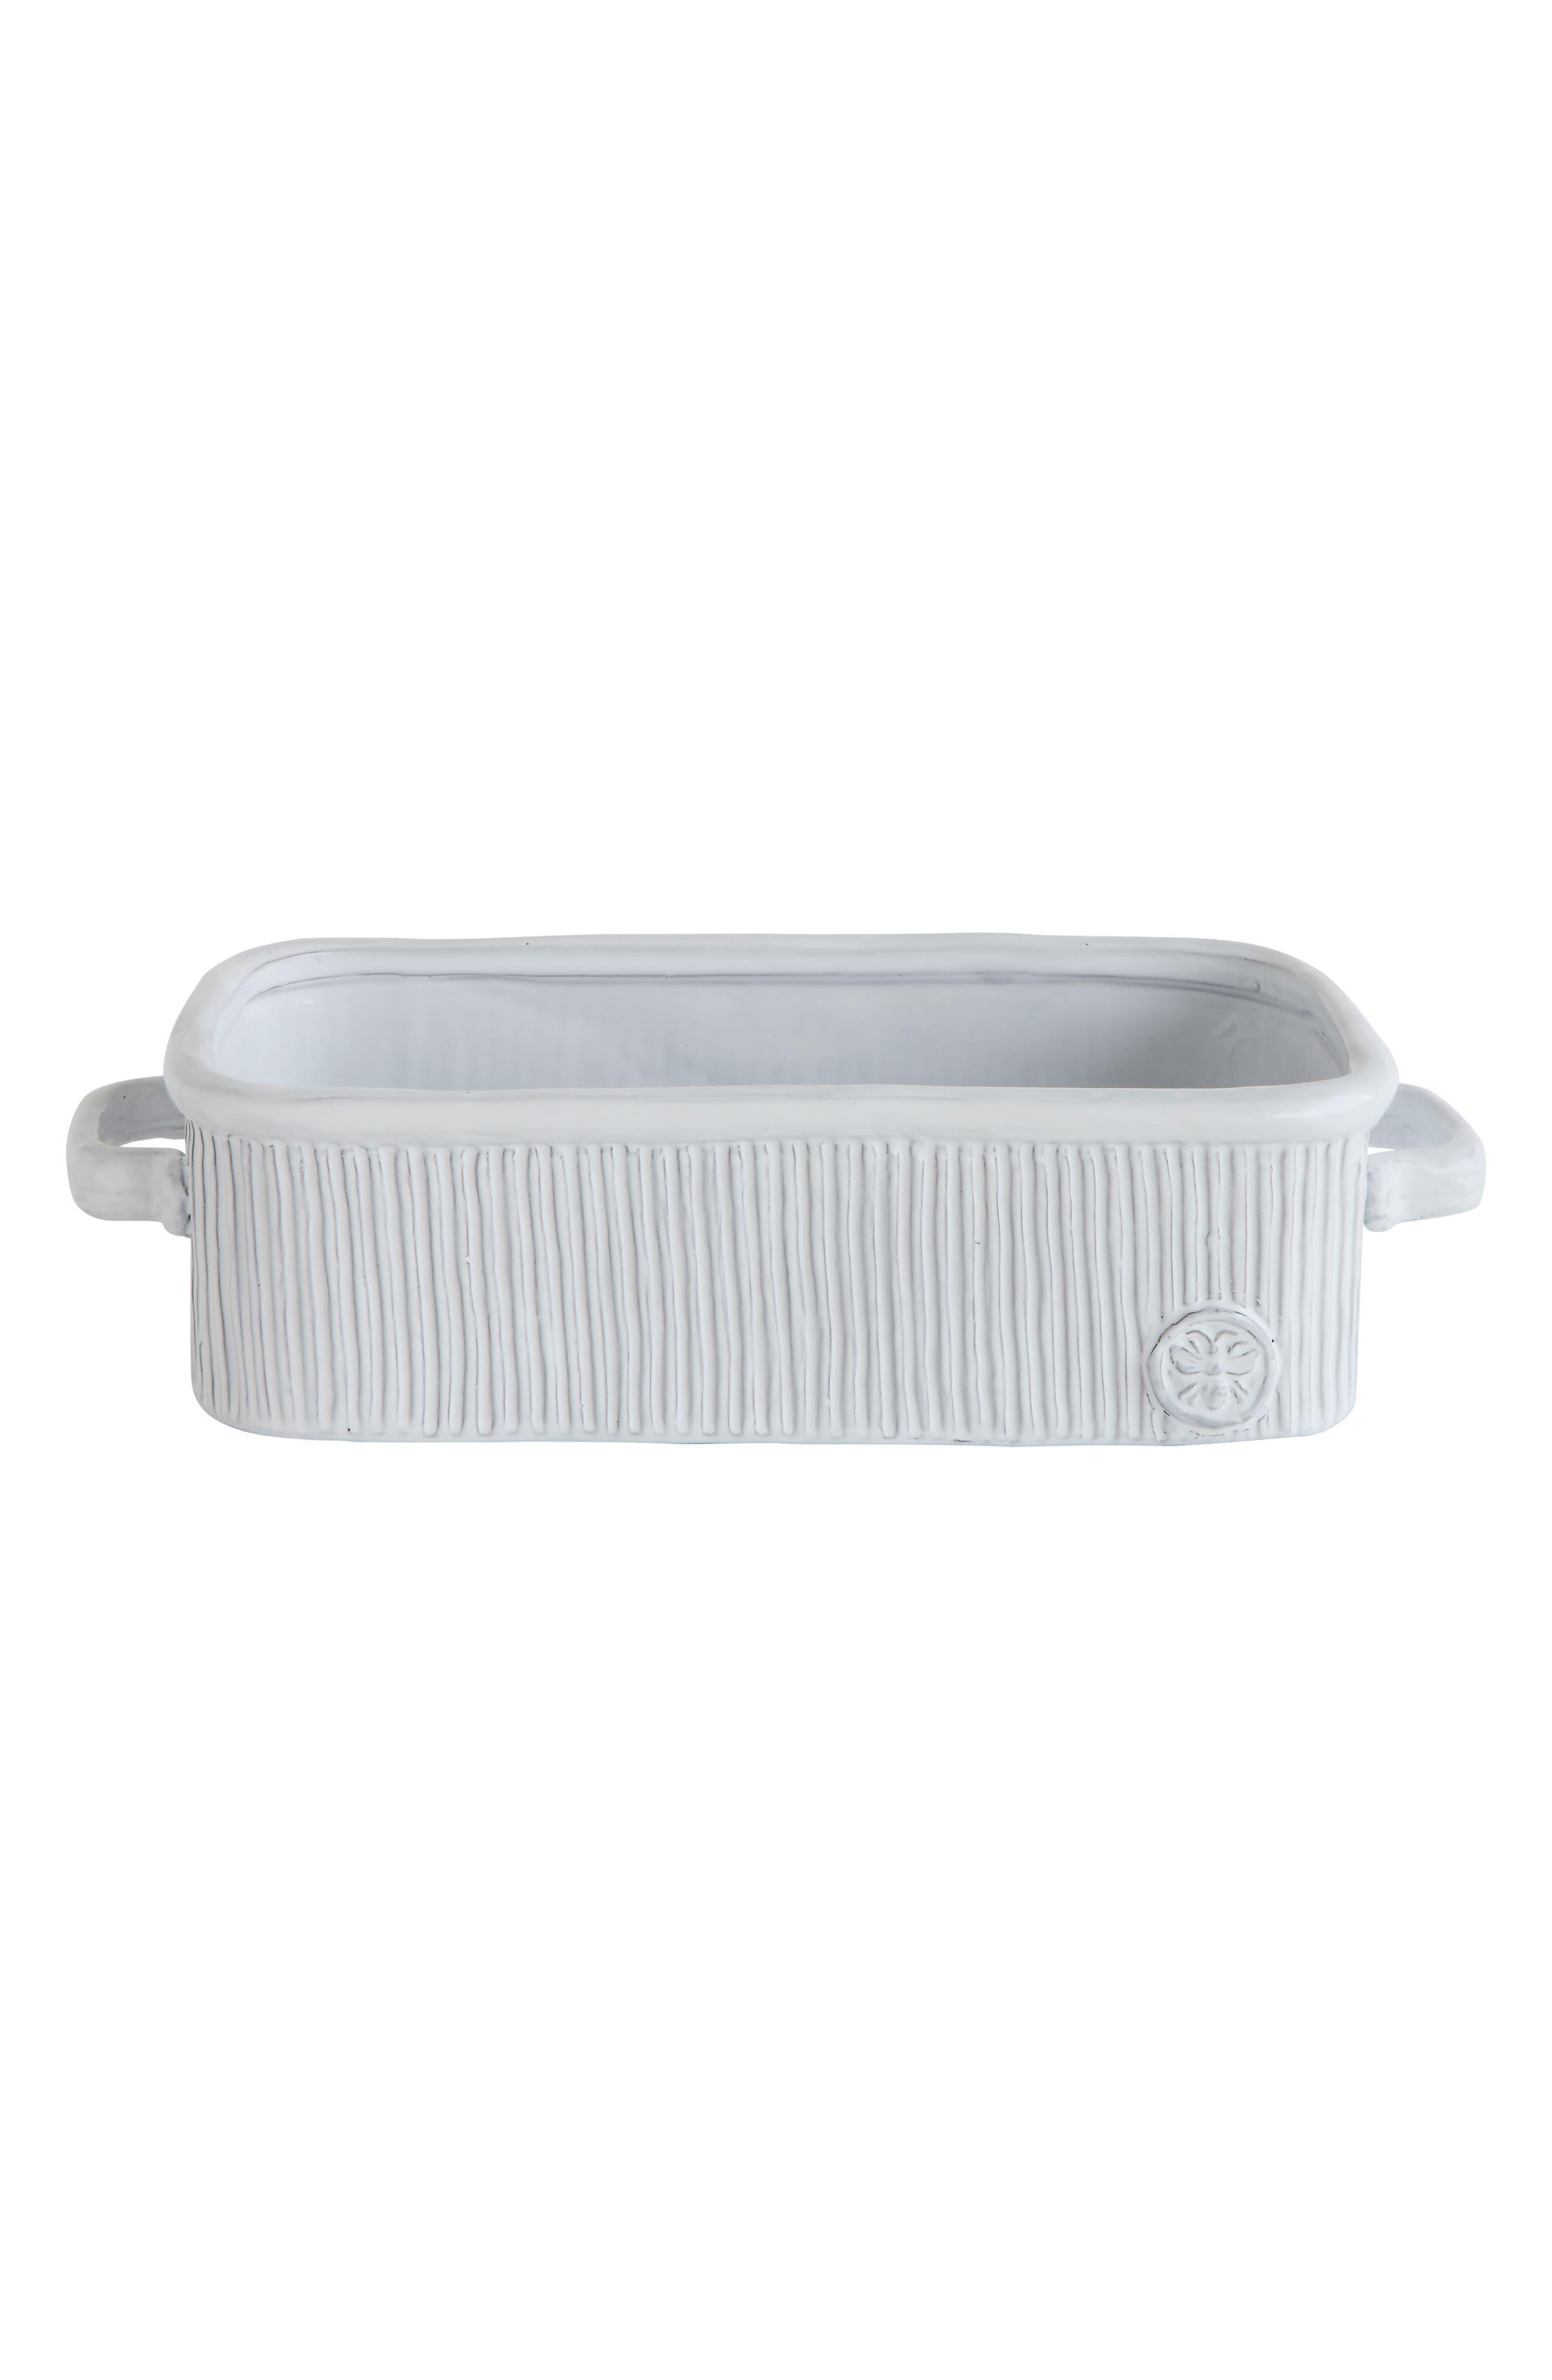 Creative Co-Op Ceramic Loaf Pan